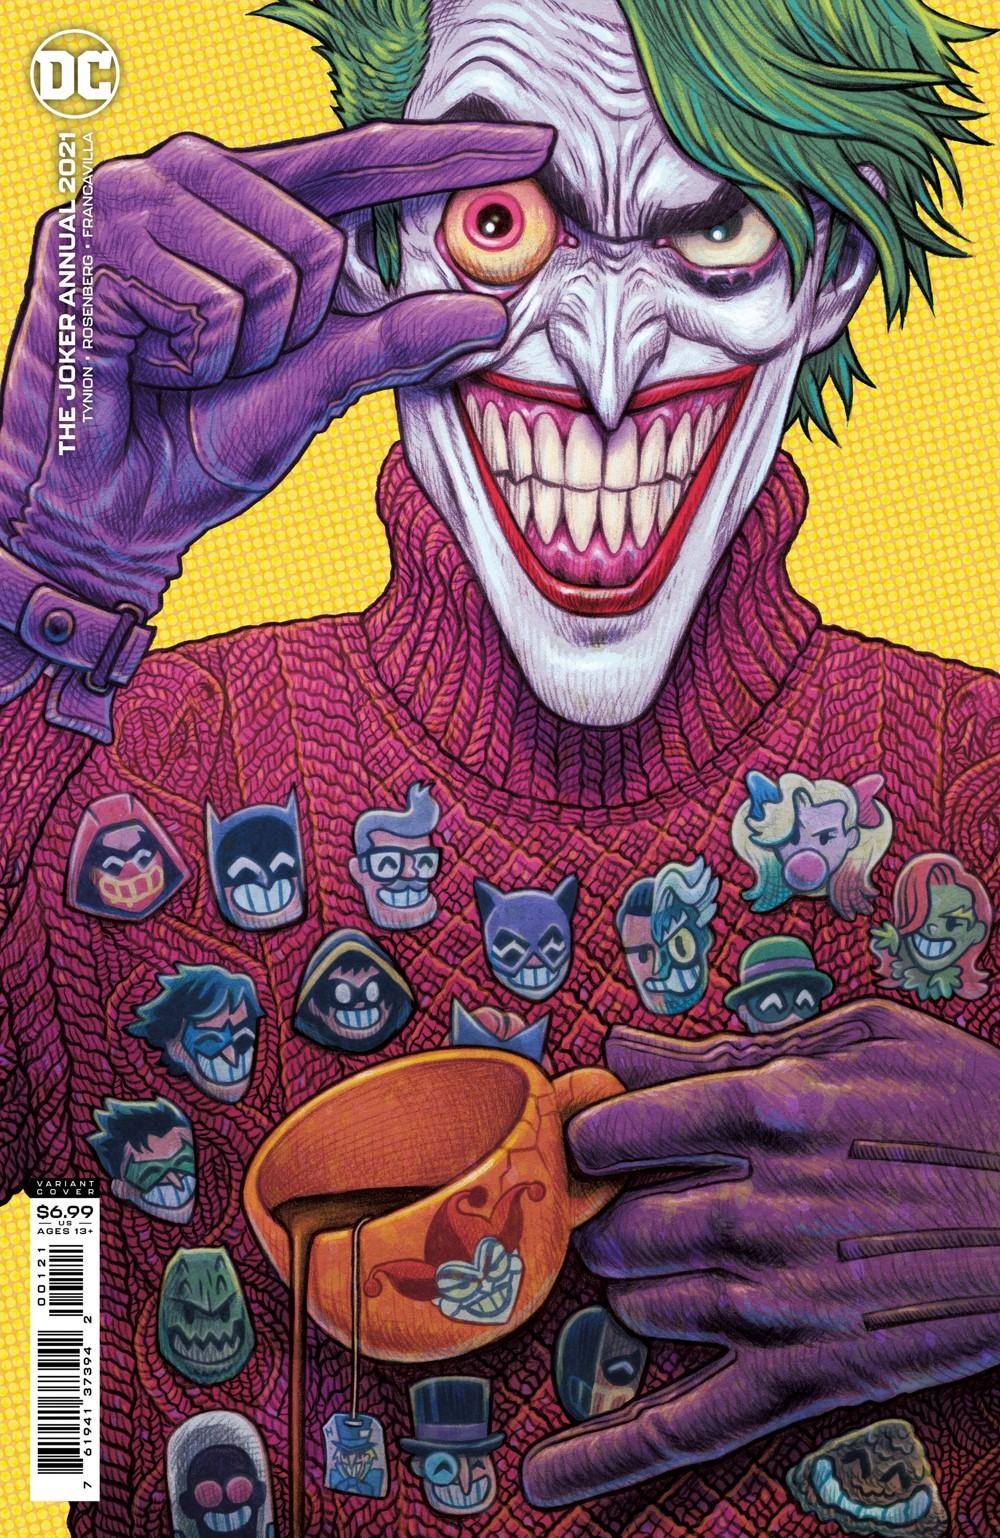 JKRANN21_Cv1_var_00121 DC Comics November 2021 Solicitations